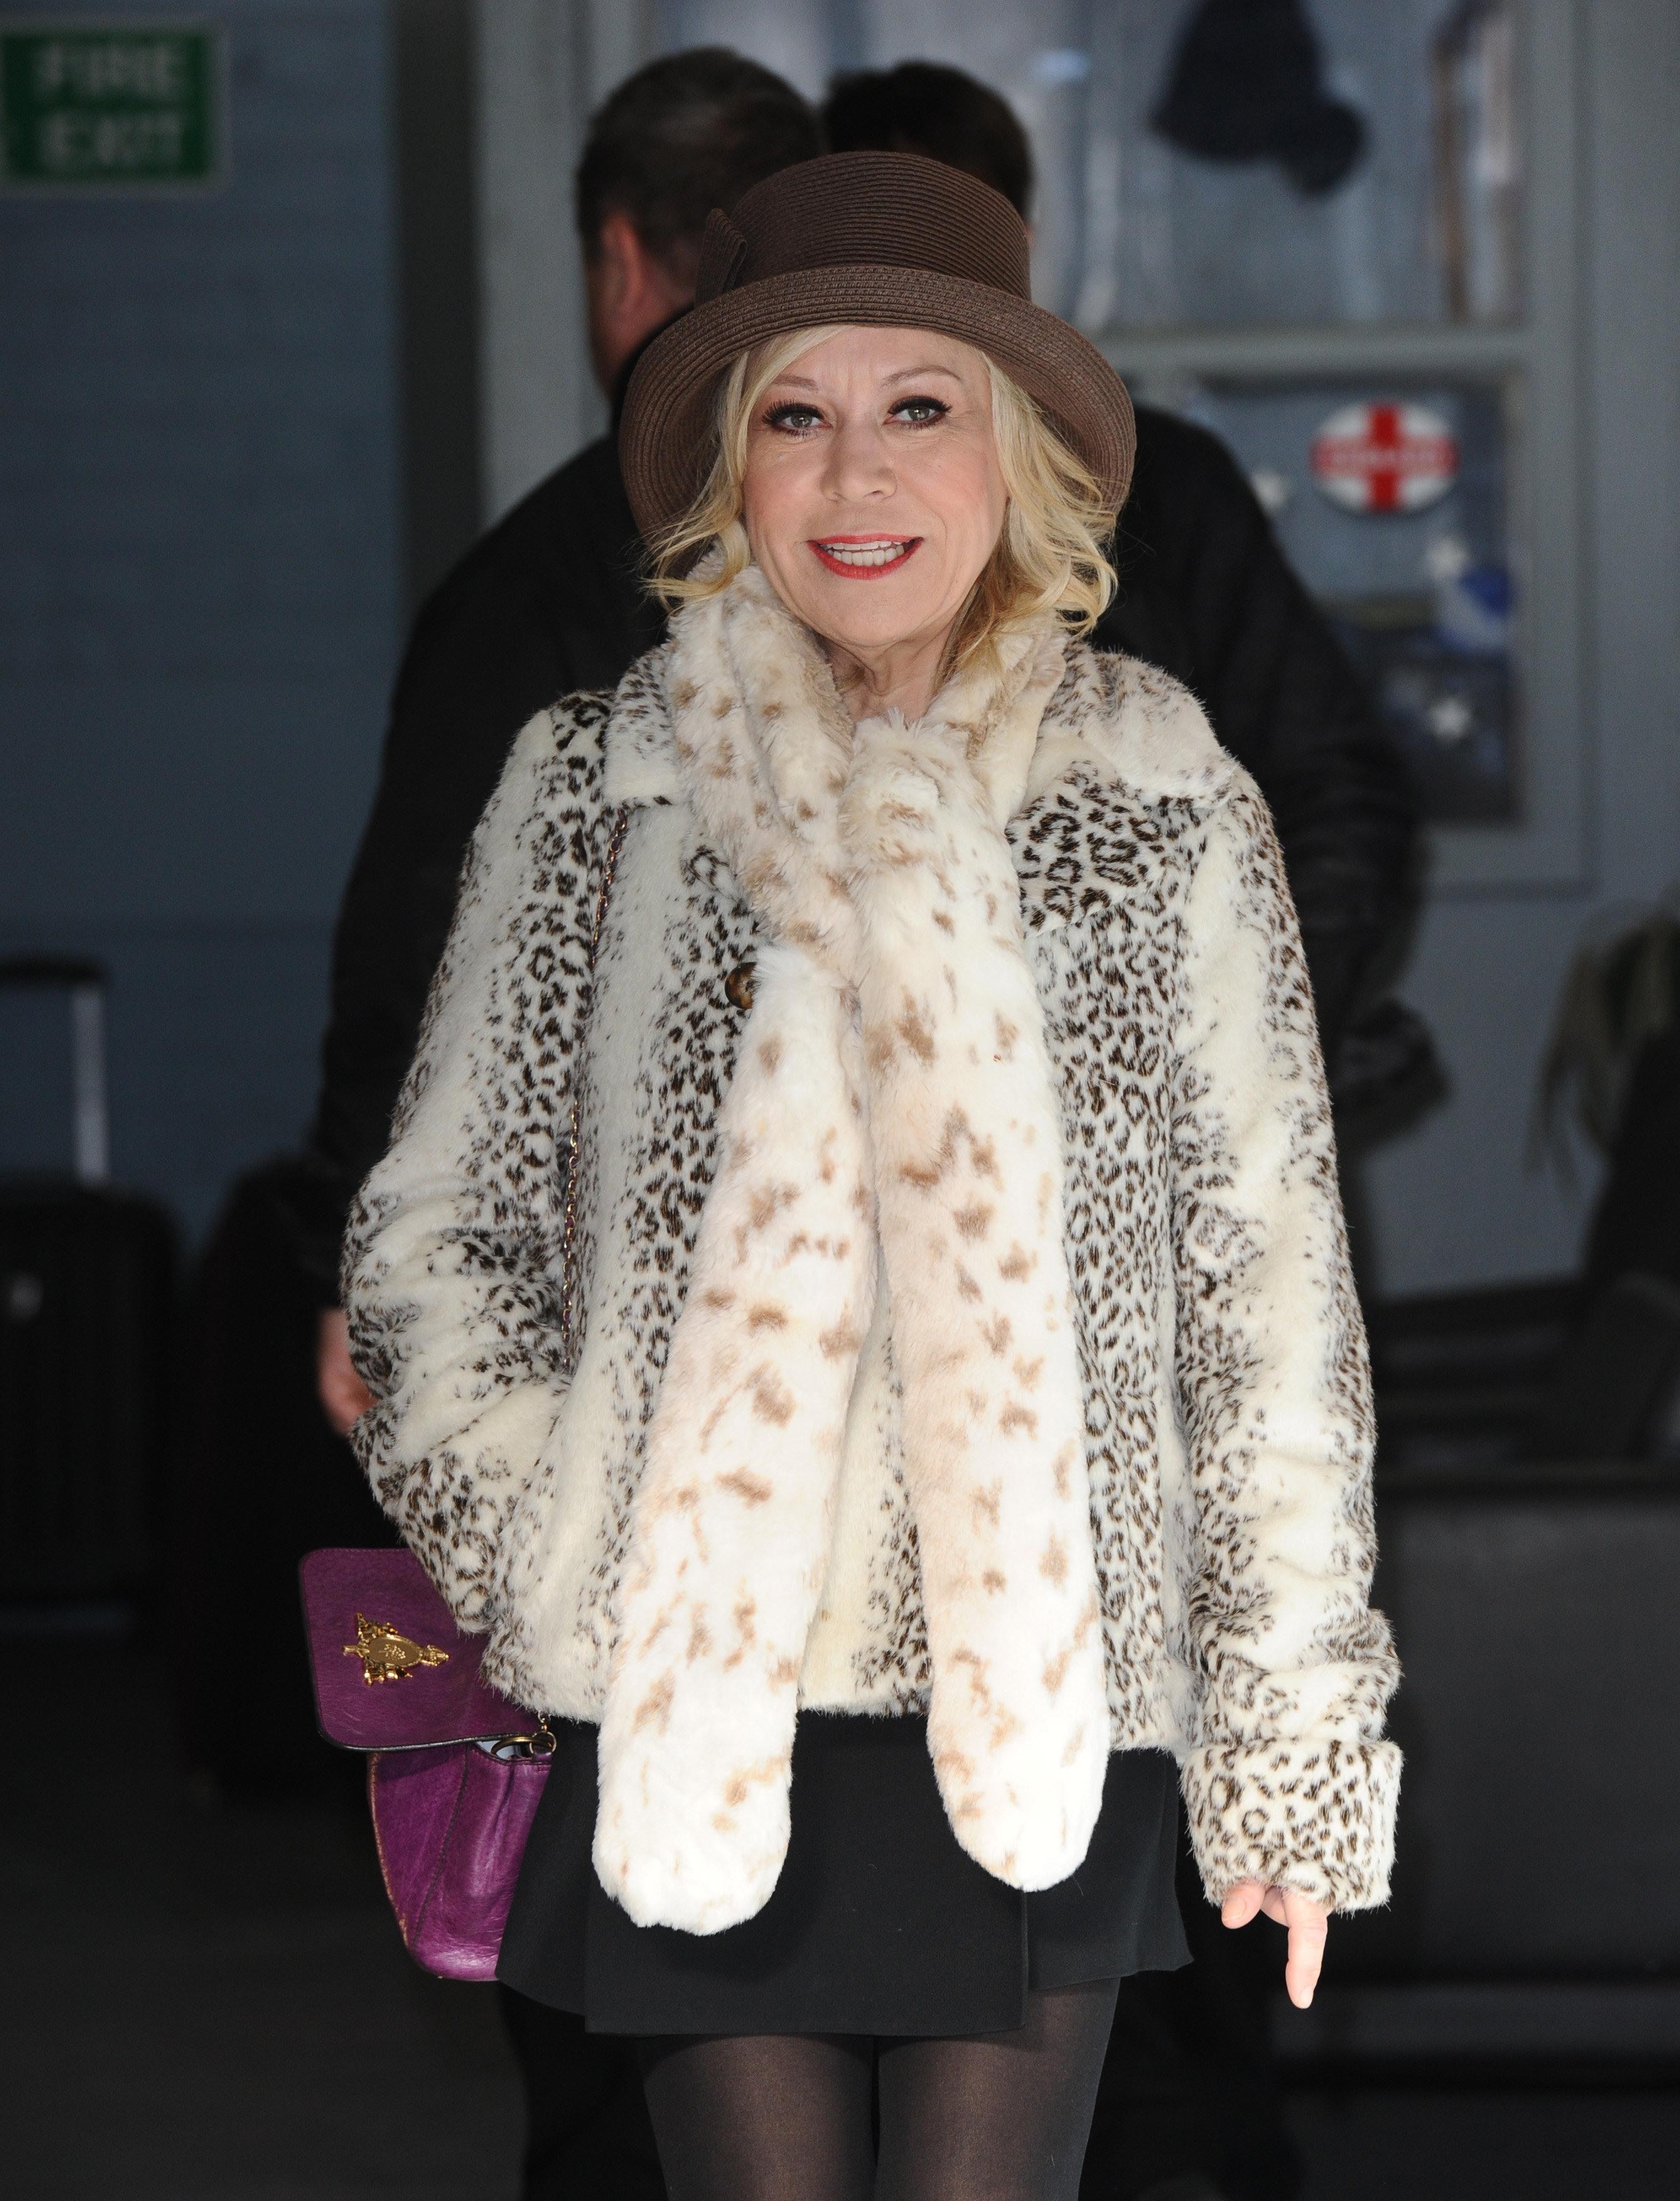 Tina Malone Seen Leaving The ITV Studios In London